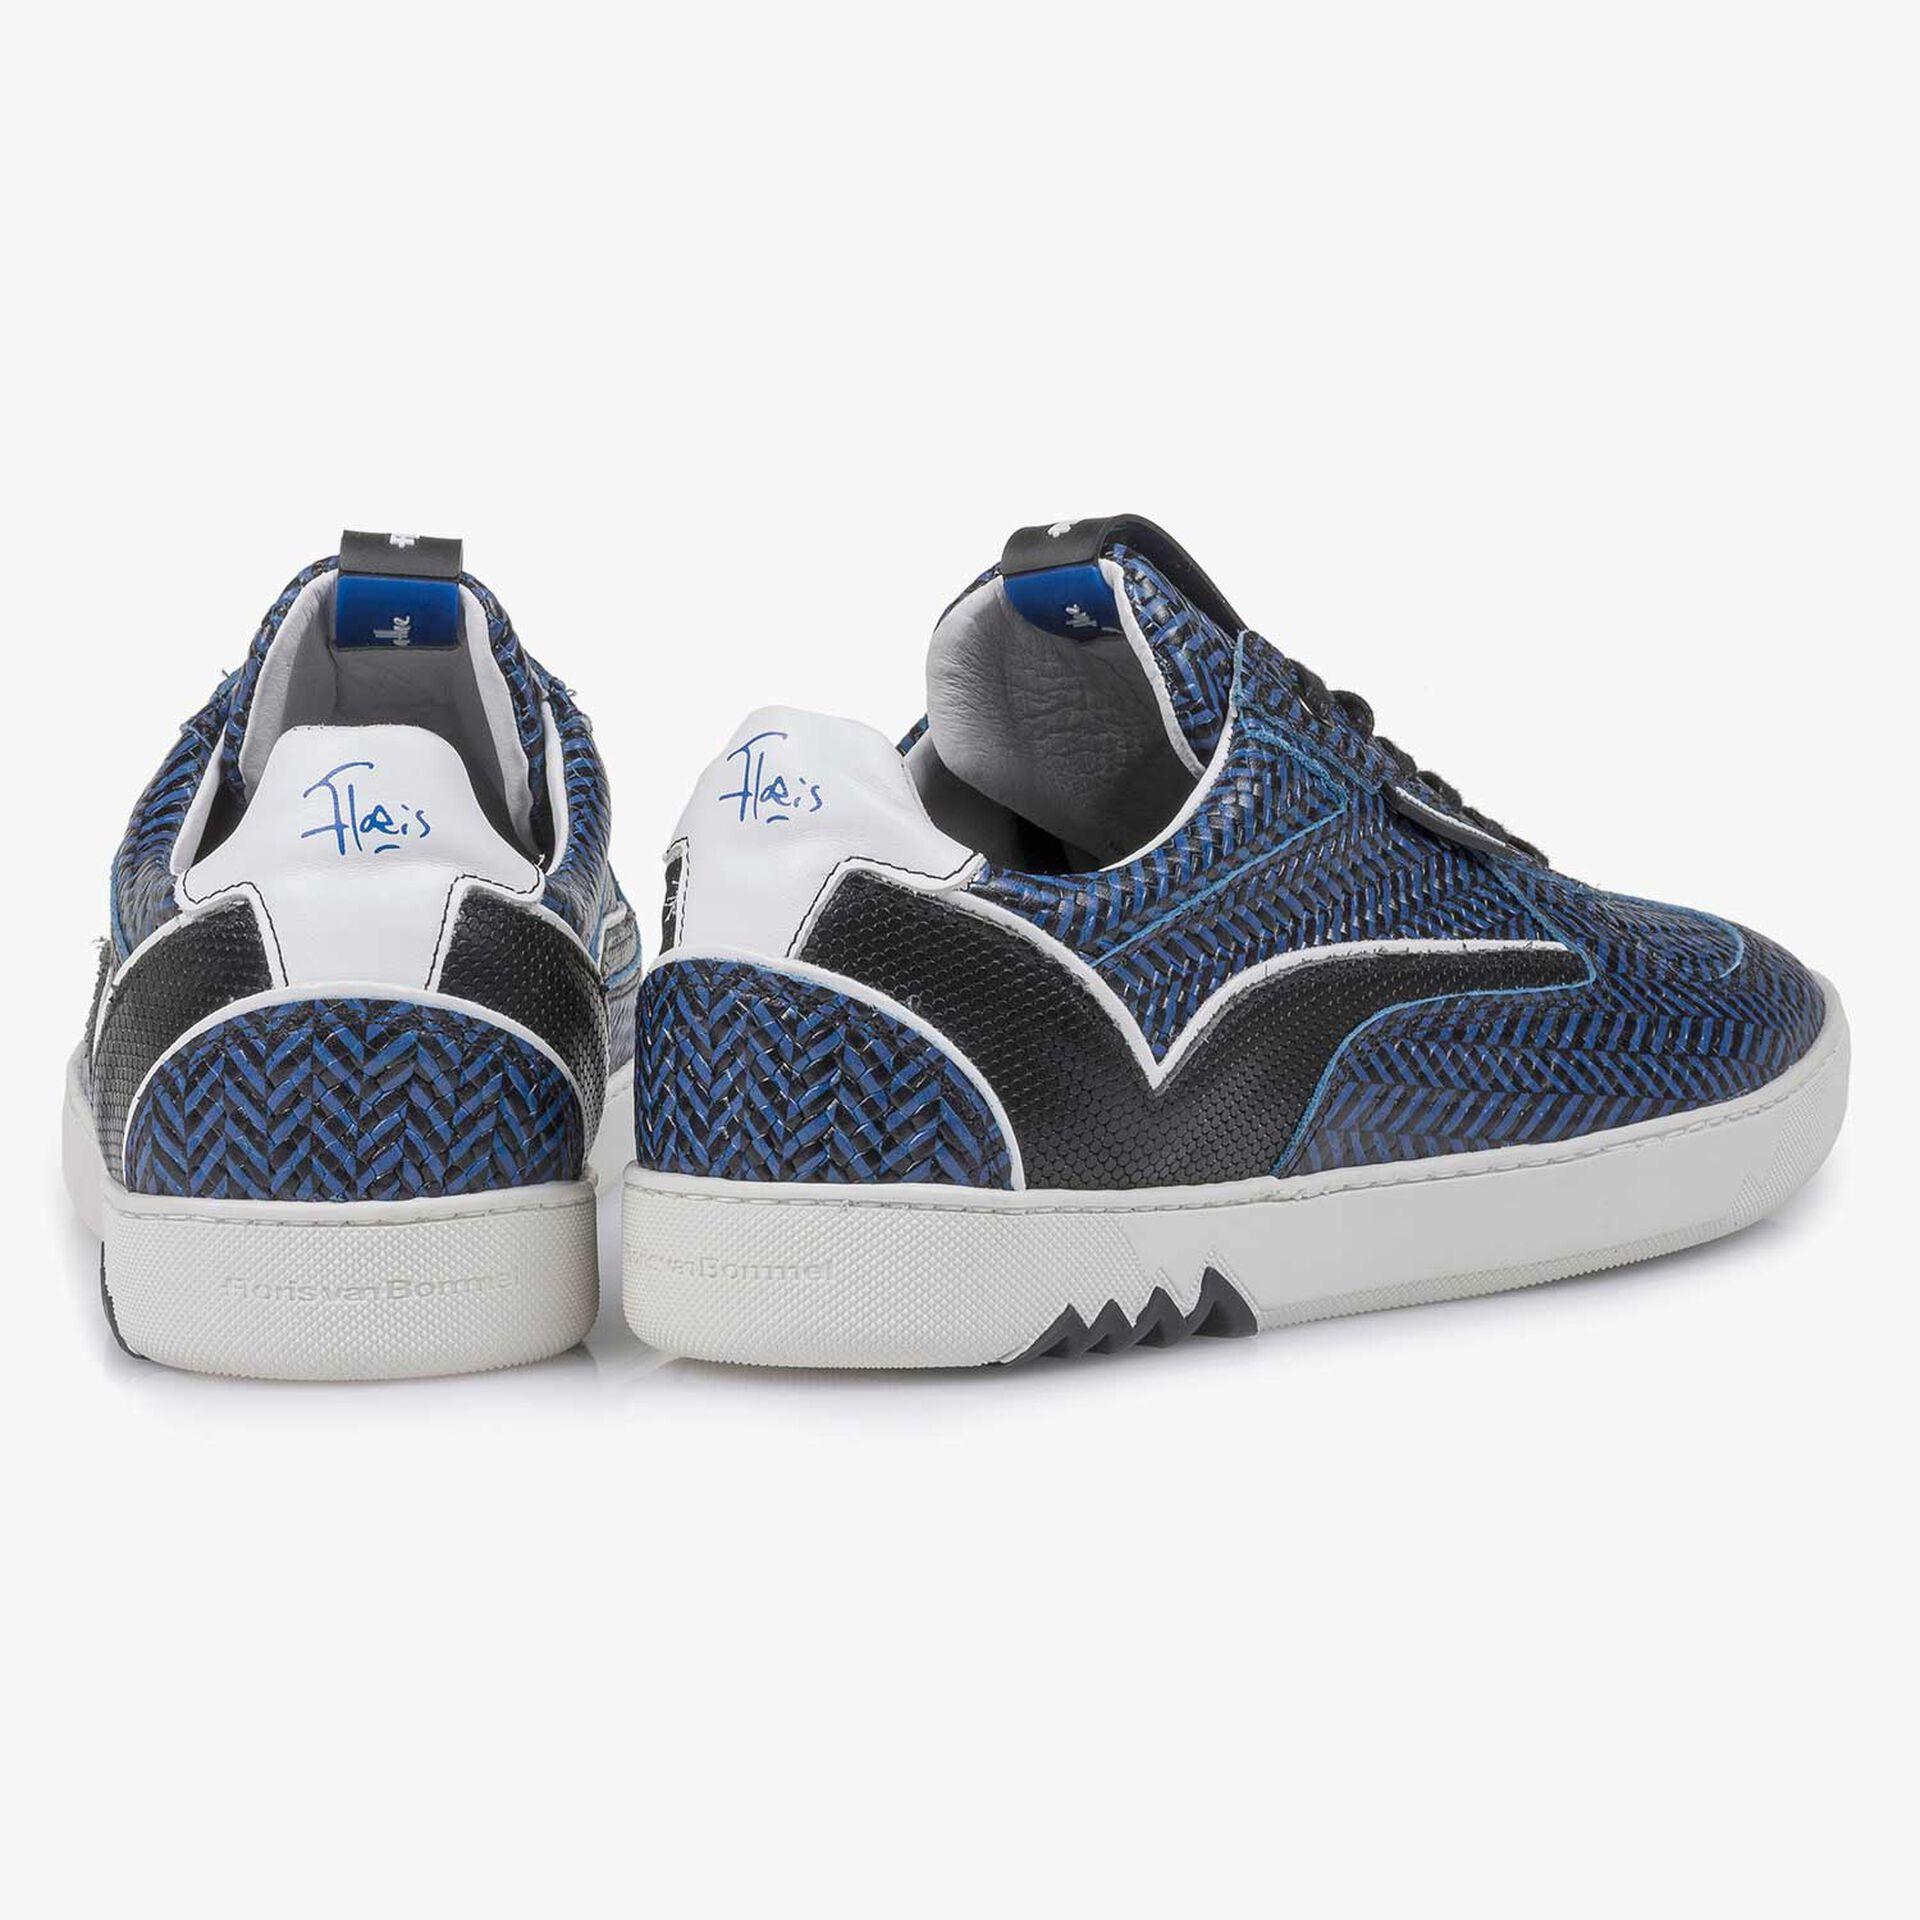 Blue leather sneaker with a herringbone pattern